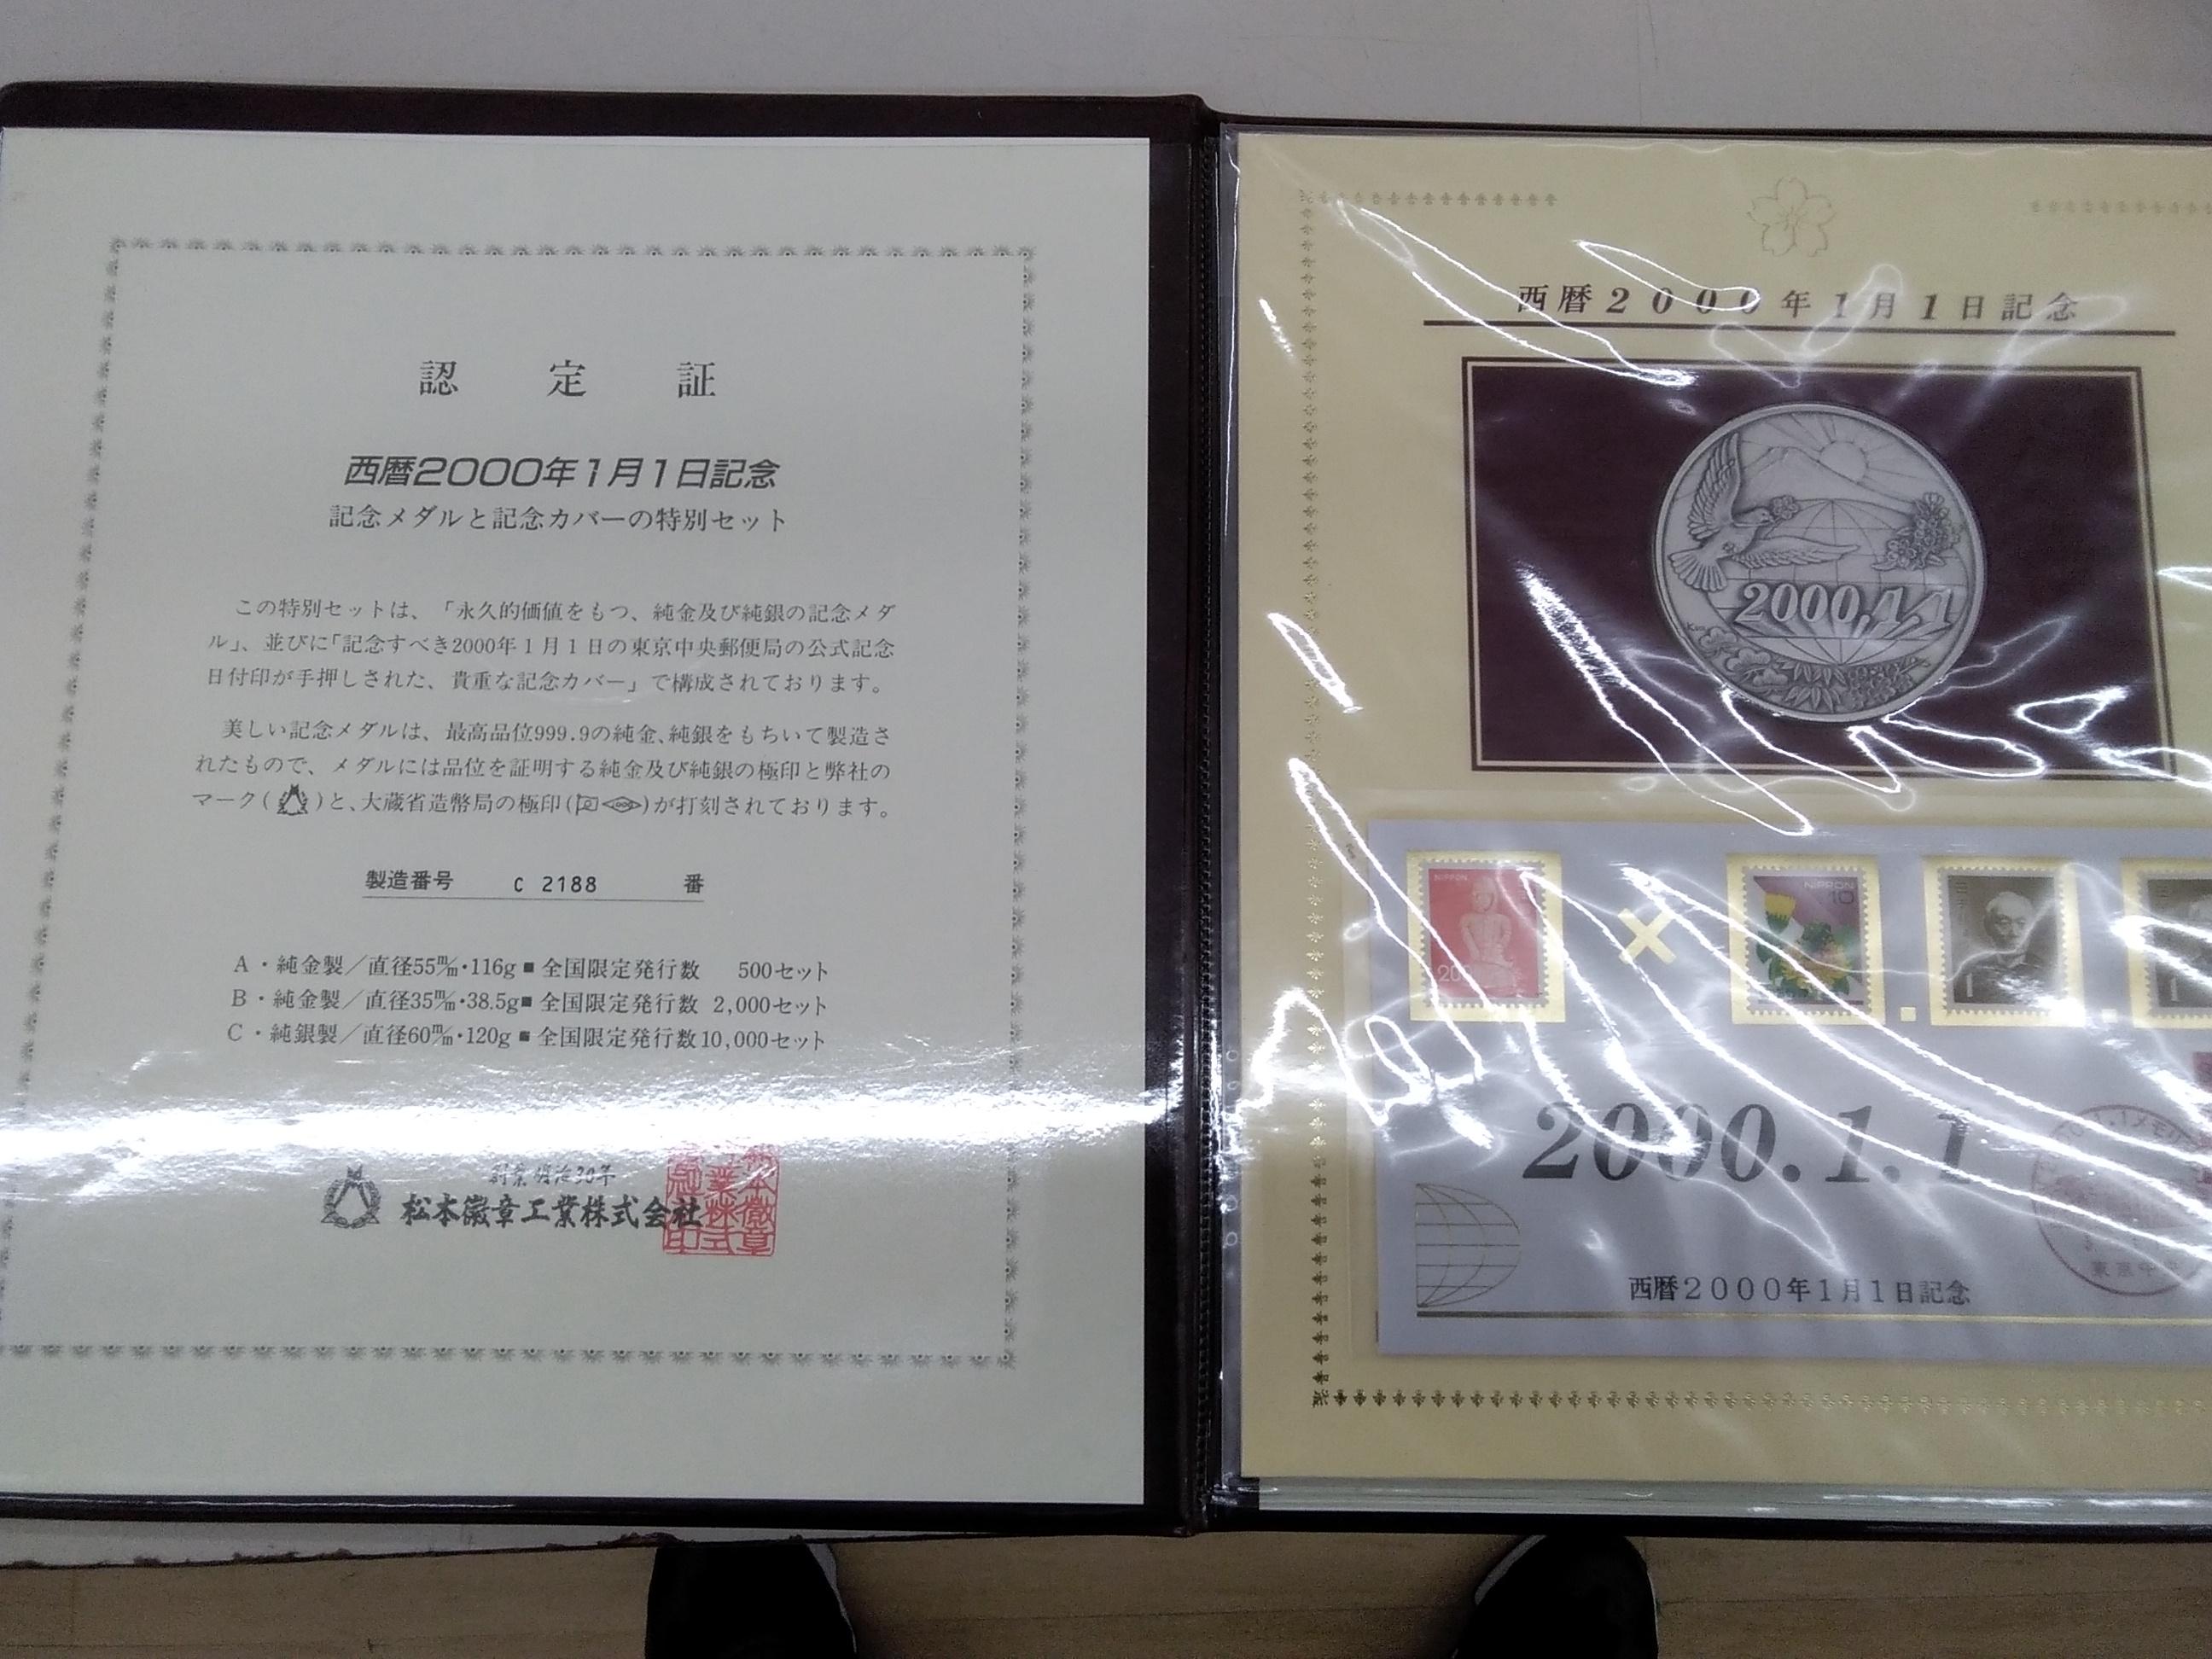 純銀製西暦2000年1月1日記念メダル|西暦2000年